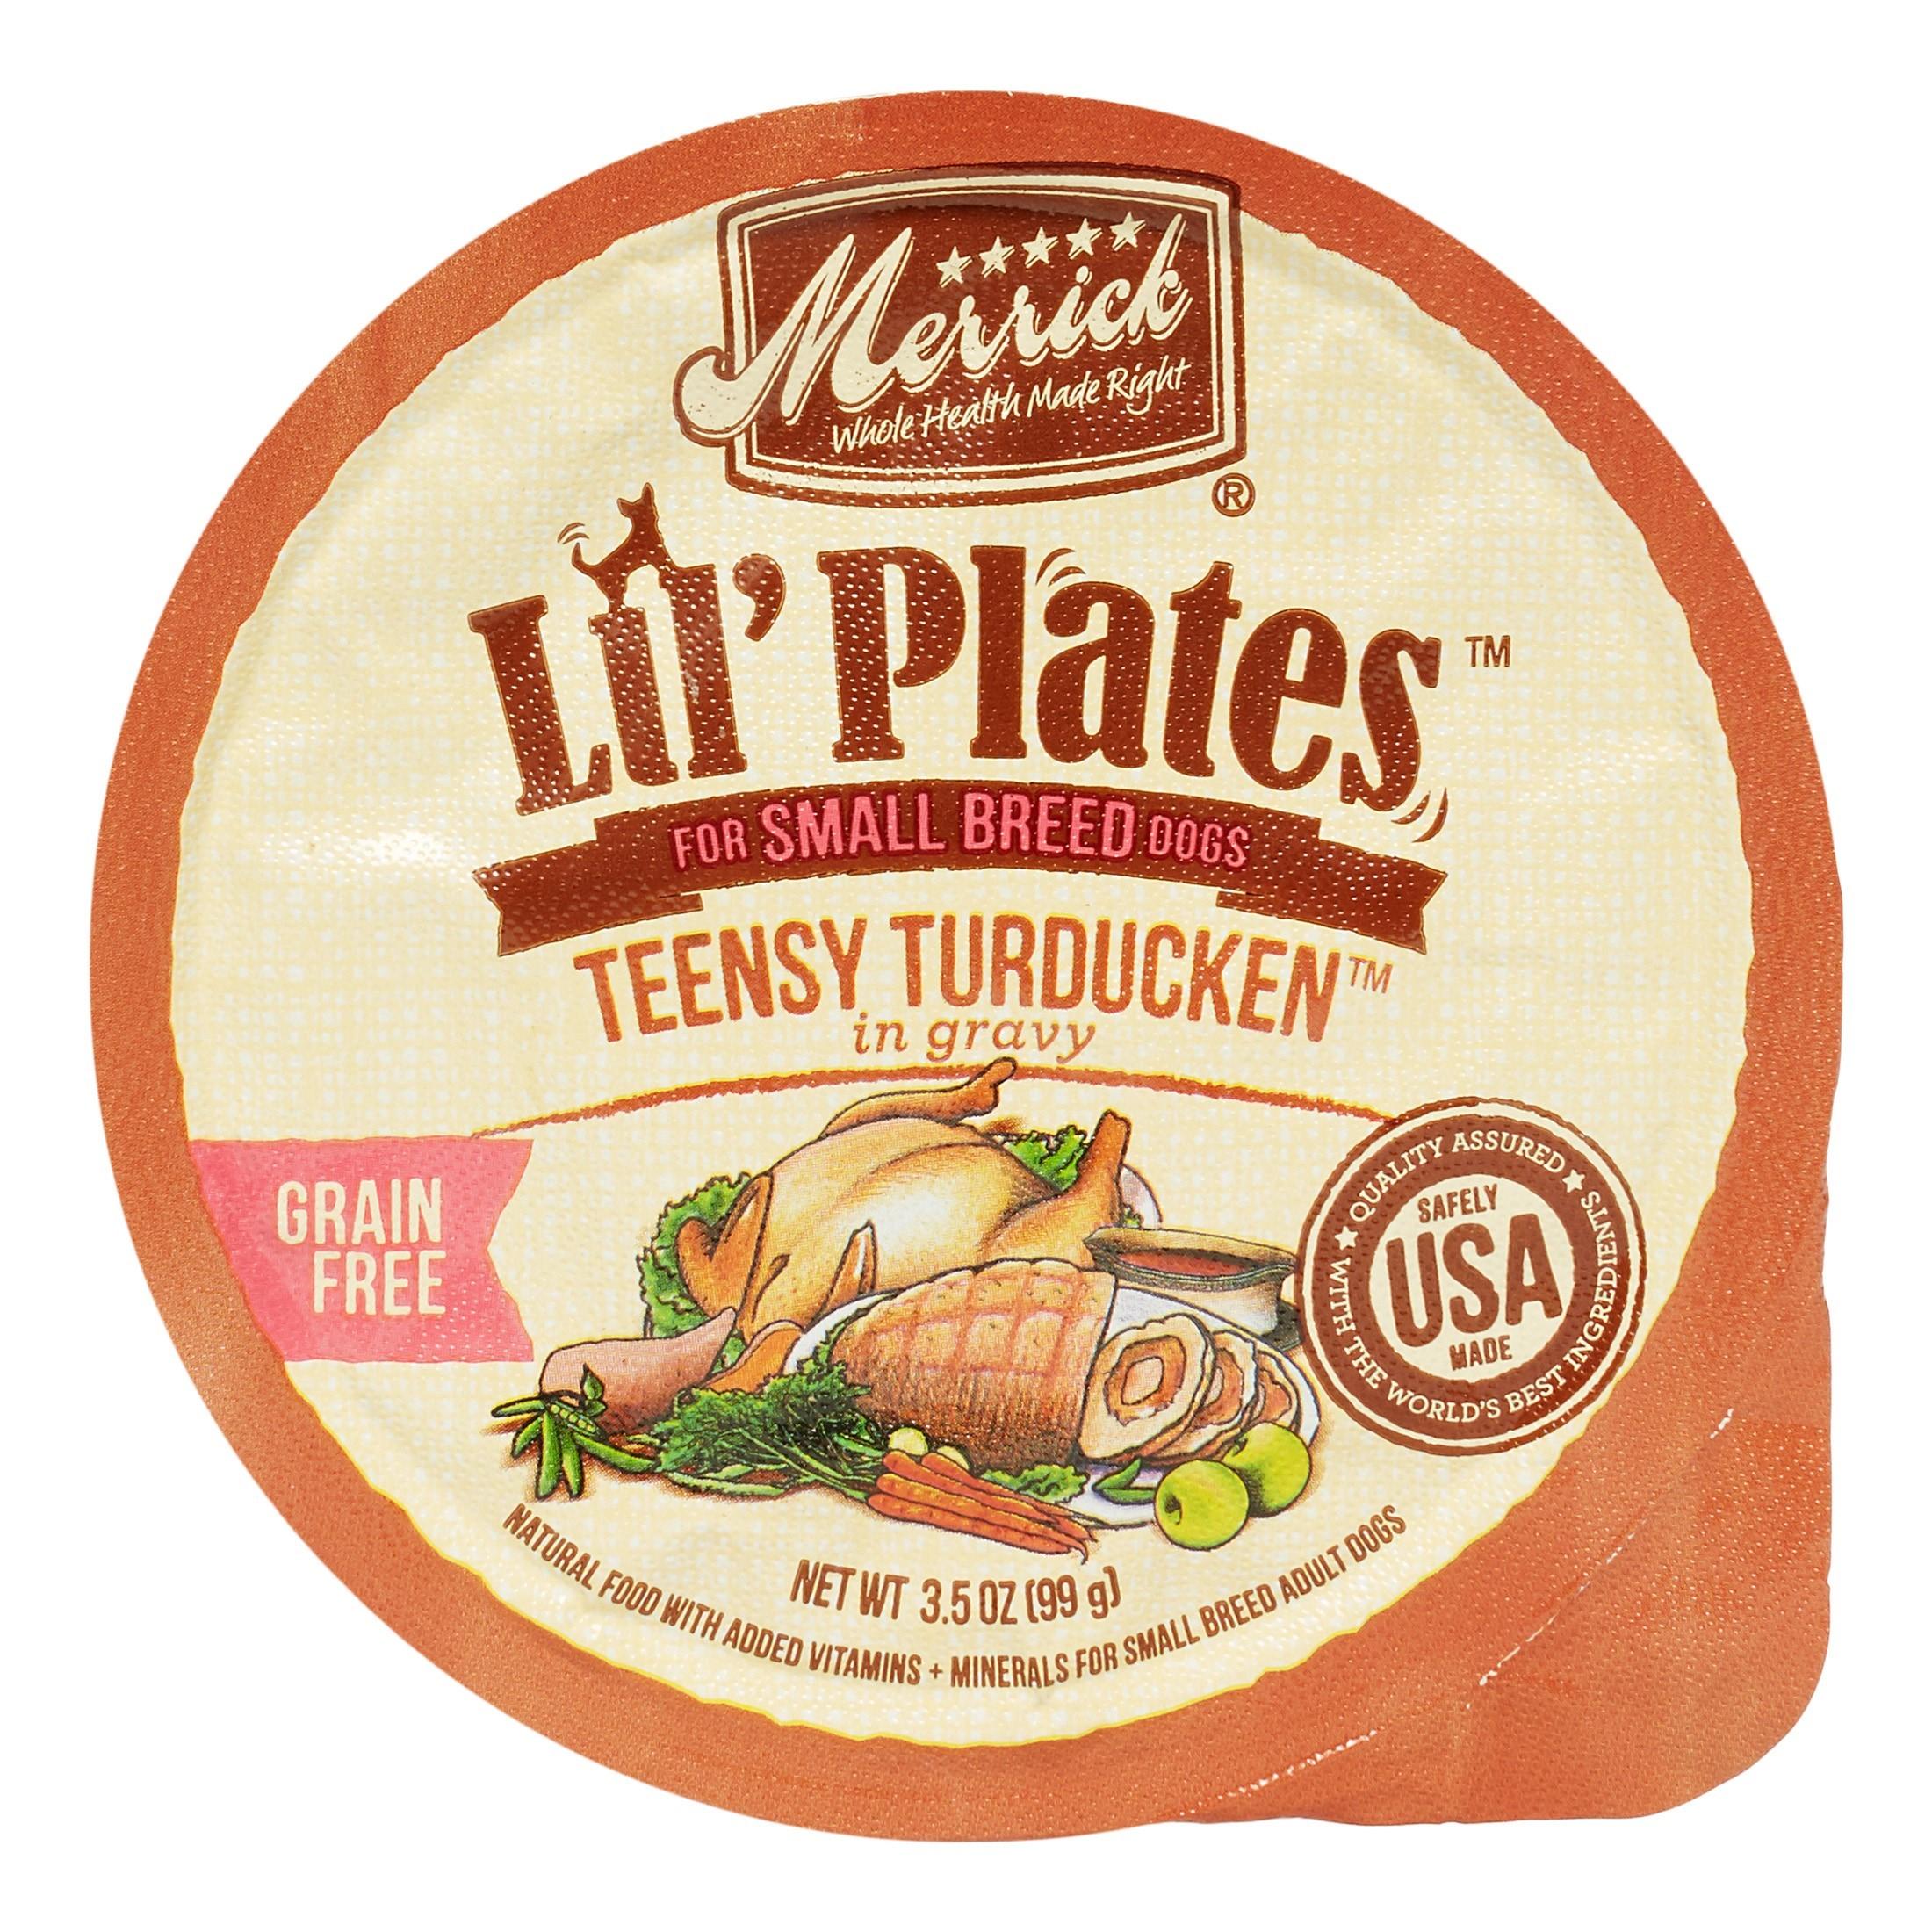 Merrick Lil' Plates Grain-Free Teensy Turducken Small Breed Wet Dog Food, 3.5 oz